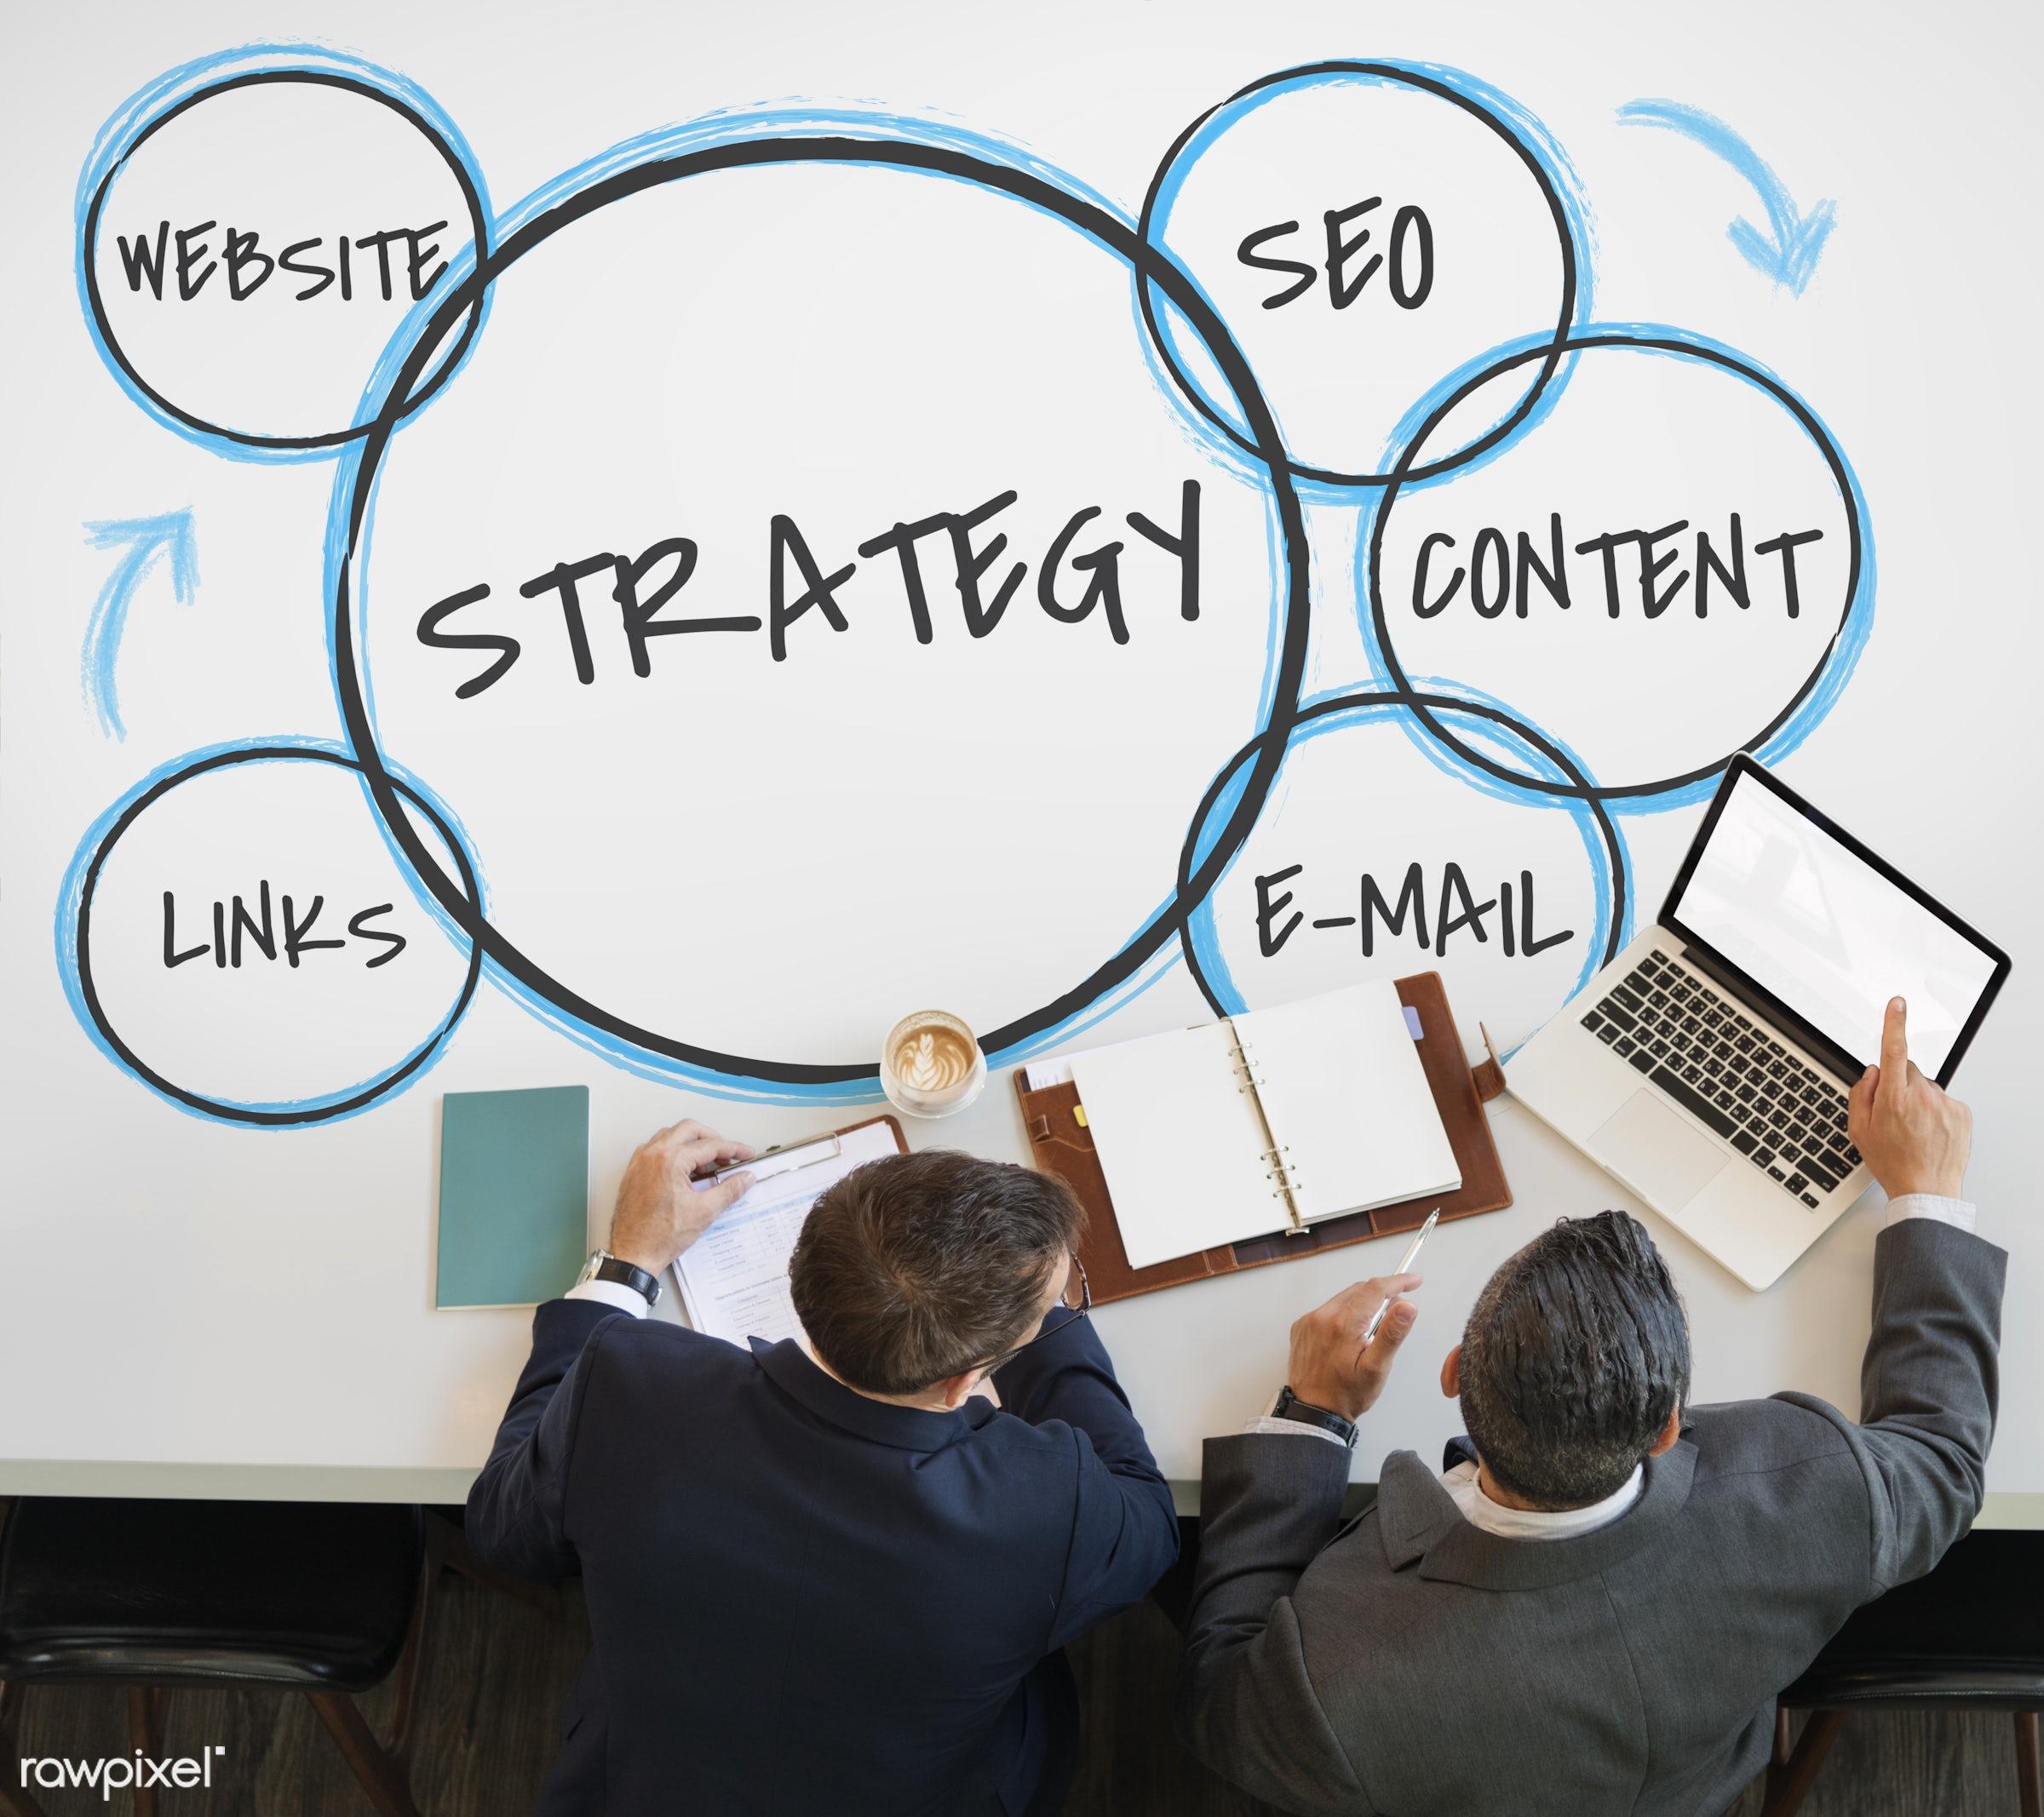 seo, website, business, businessman, businessmen, businessperson, calculator, circles, connection, content, corporate, daily...